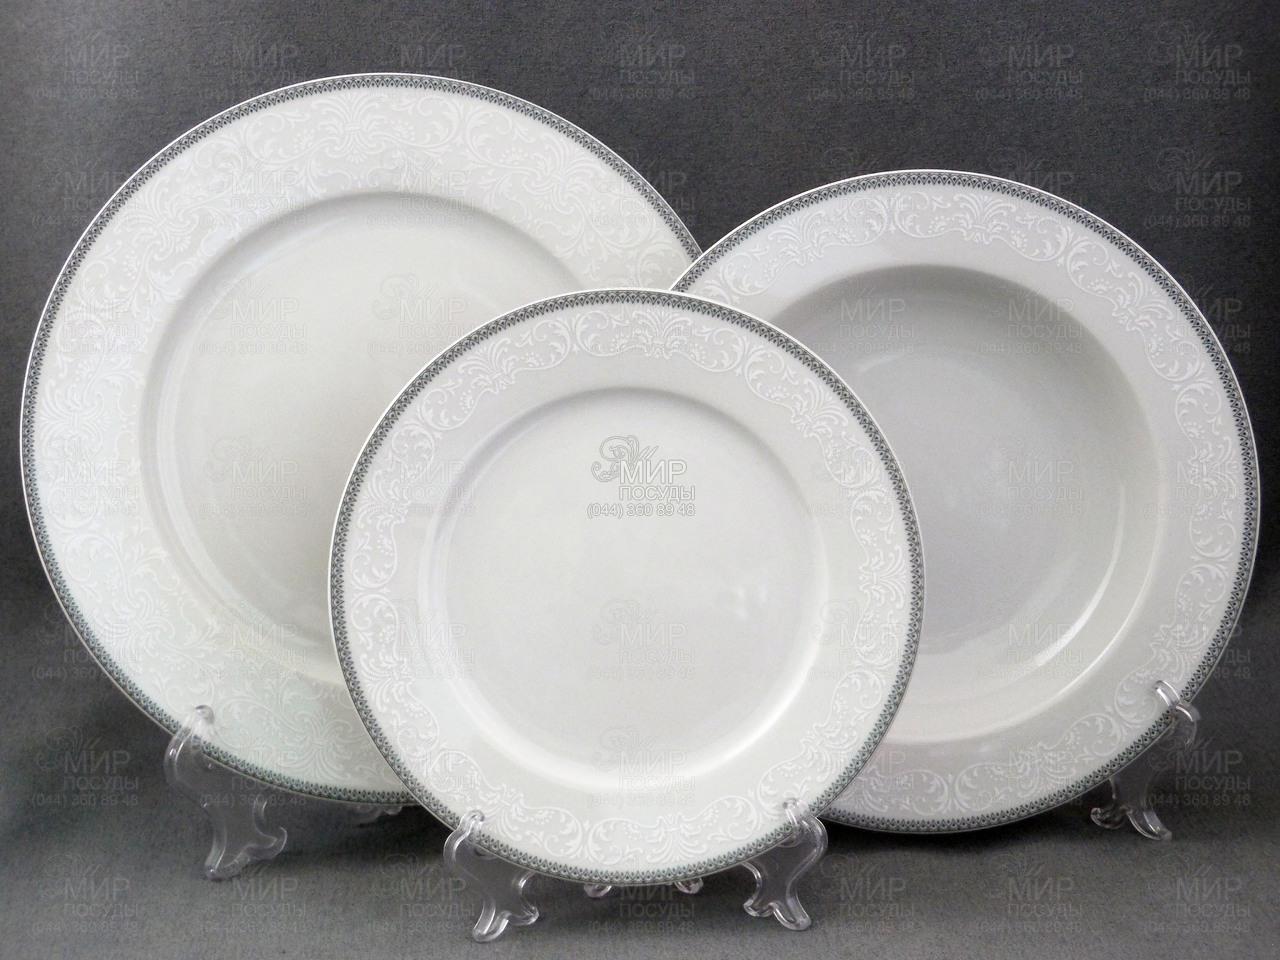 Купить набор тарелок Opal 8034800 6 18 Thun   Чехия за 2948 грн в ... 8b6e5da00e749